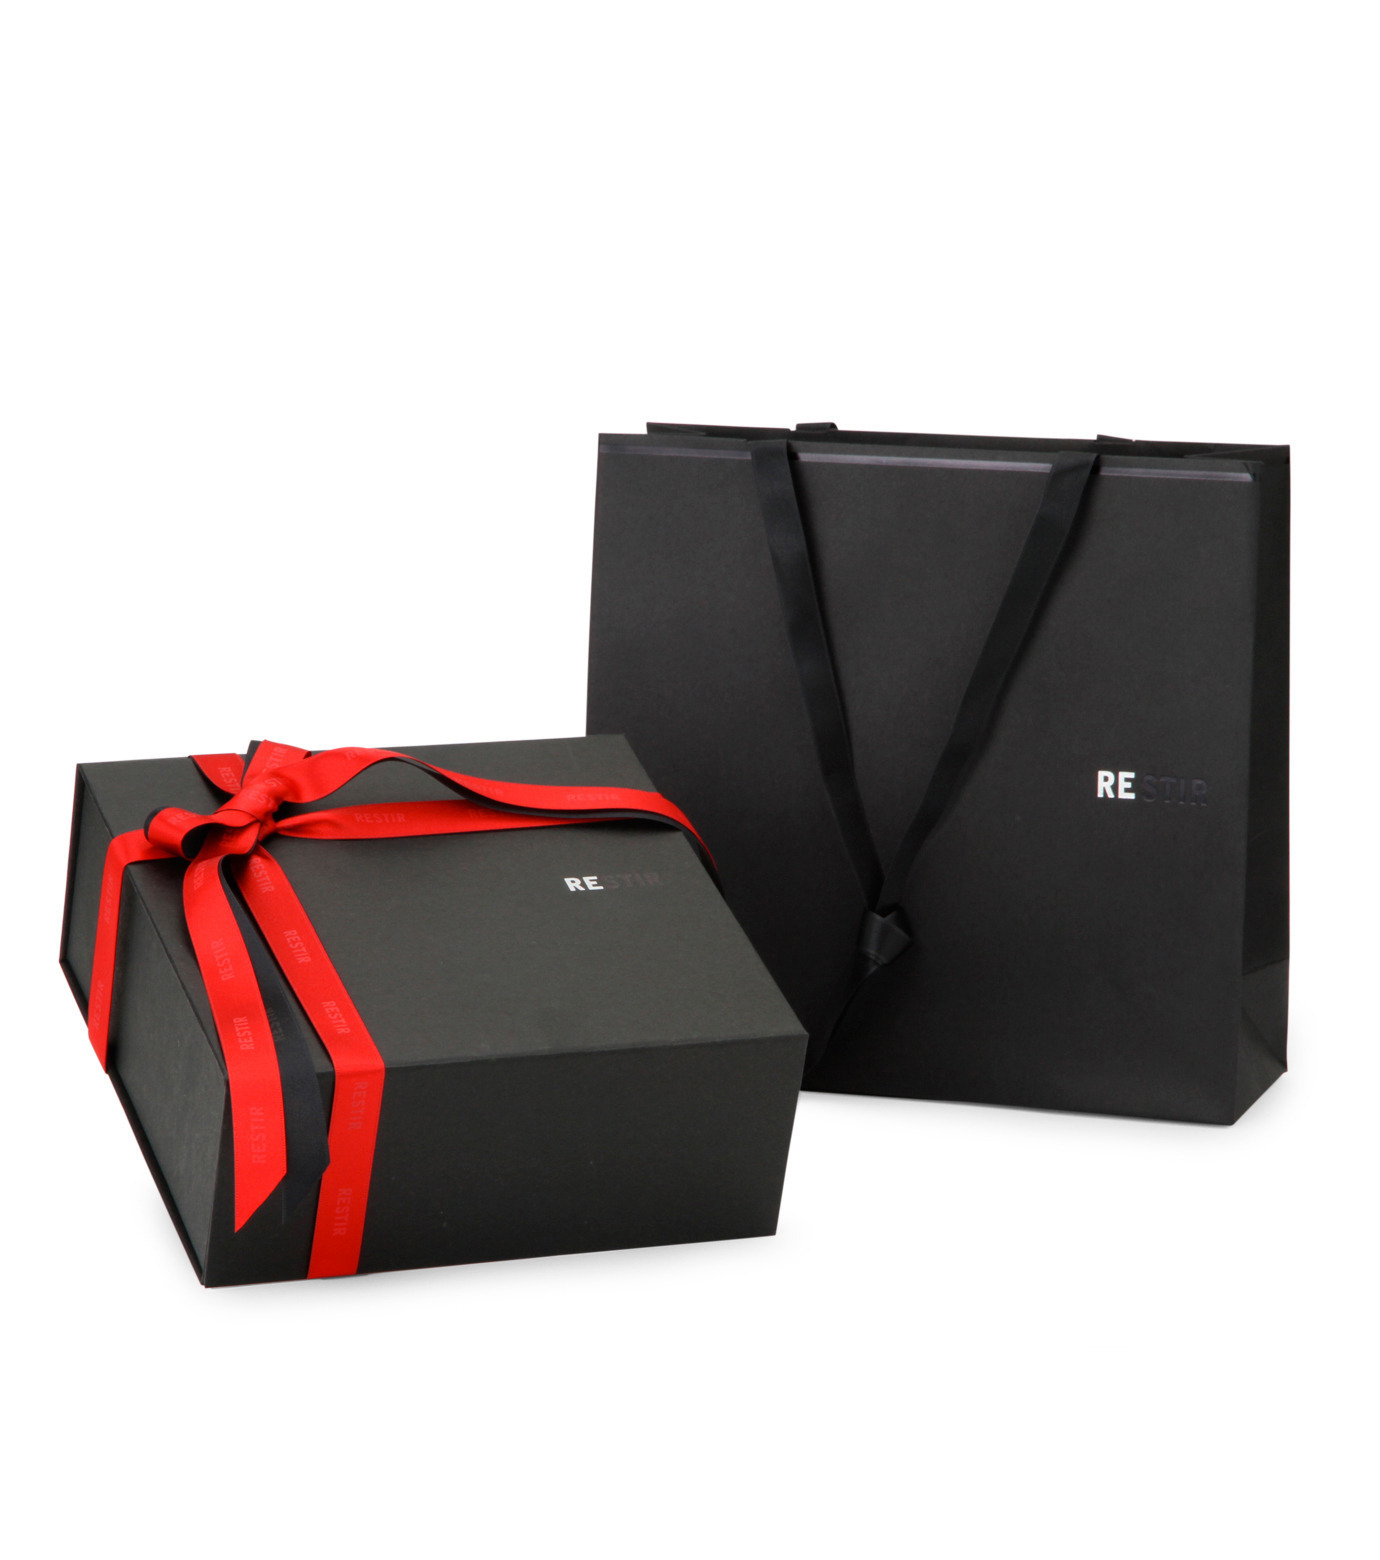 Gift Set(ギフトセット)のGentleman-NONE-Giftset-gen-0 拡大詳細画像5